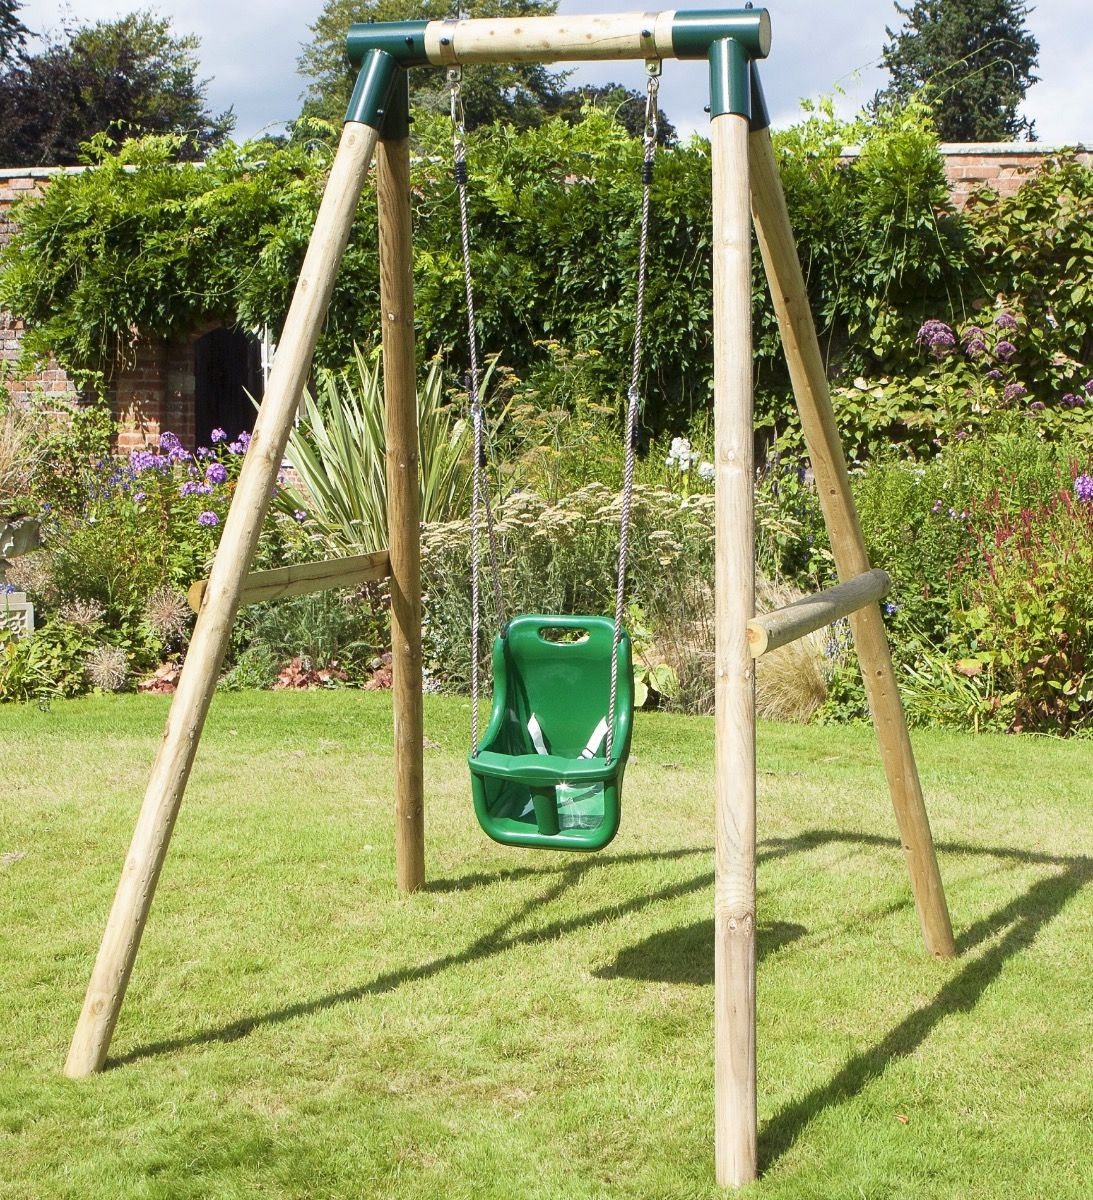 Rebo Wooden Garden Swing Sets Pluto